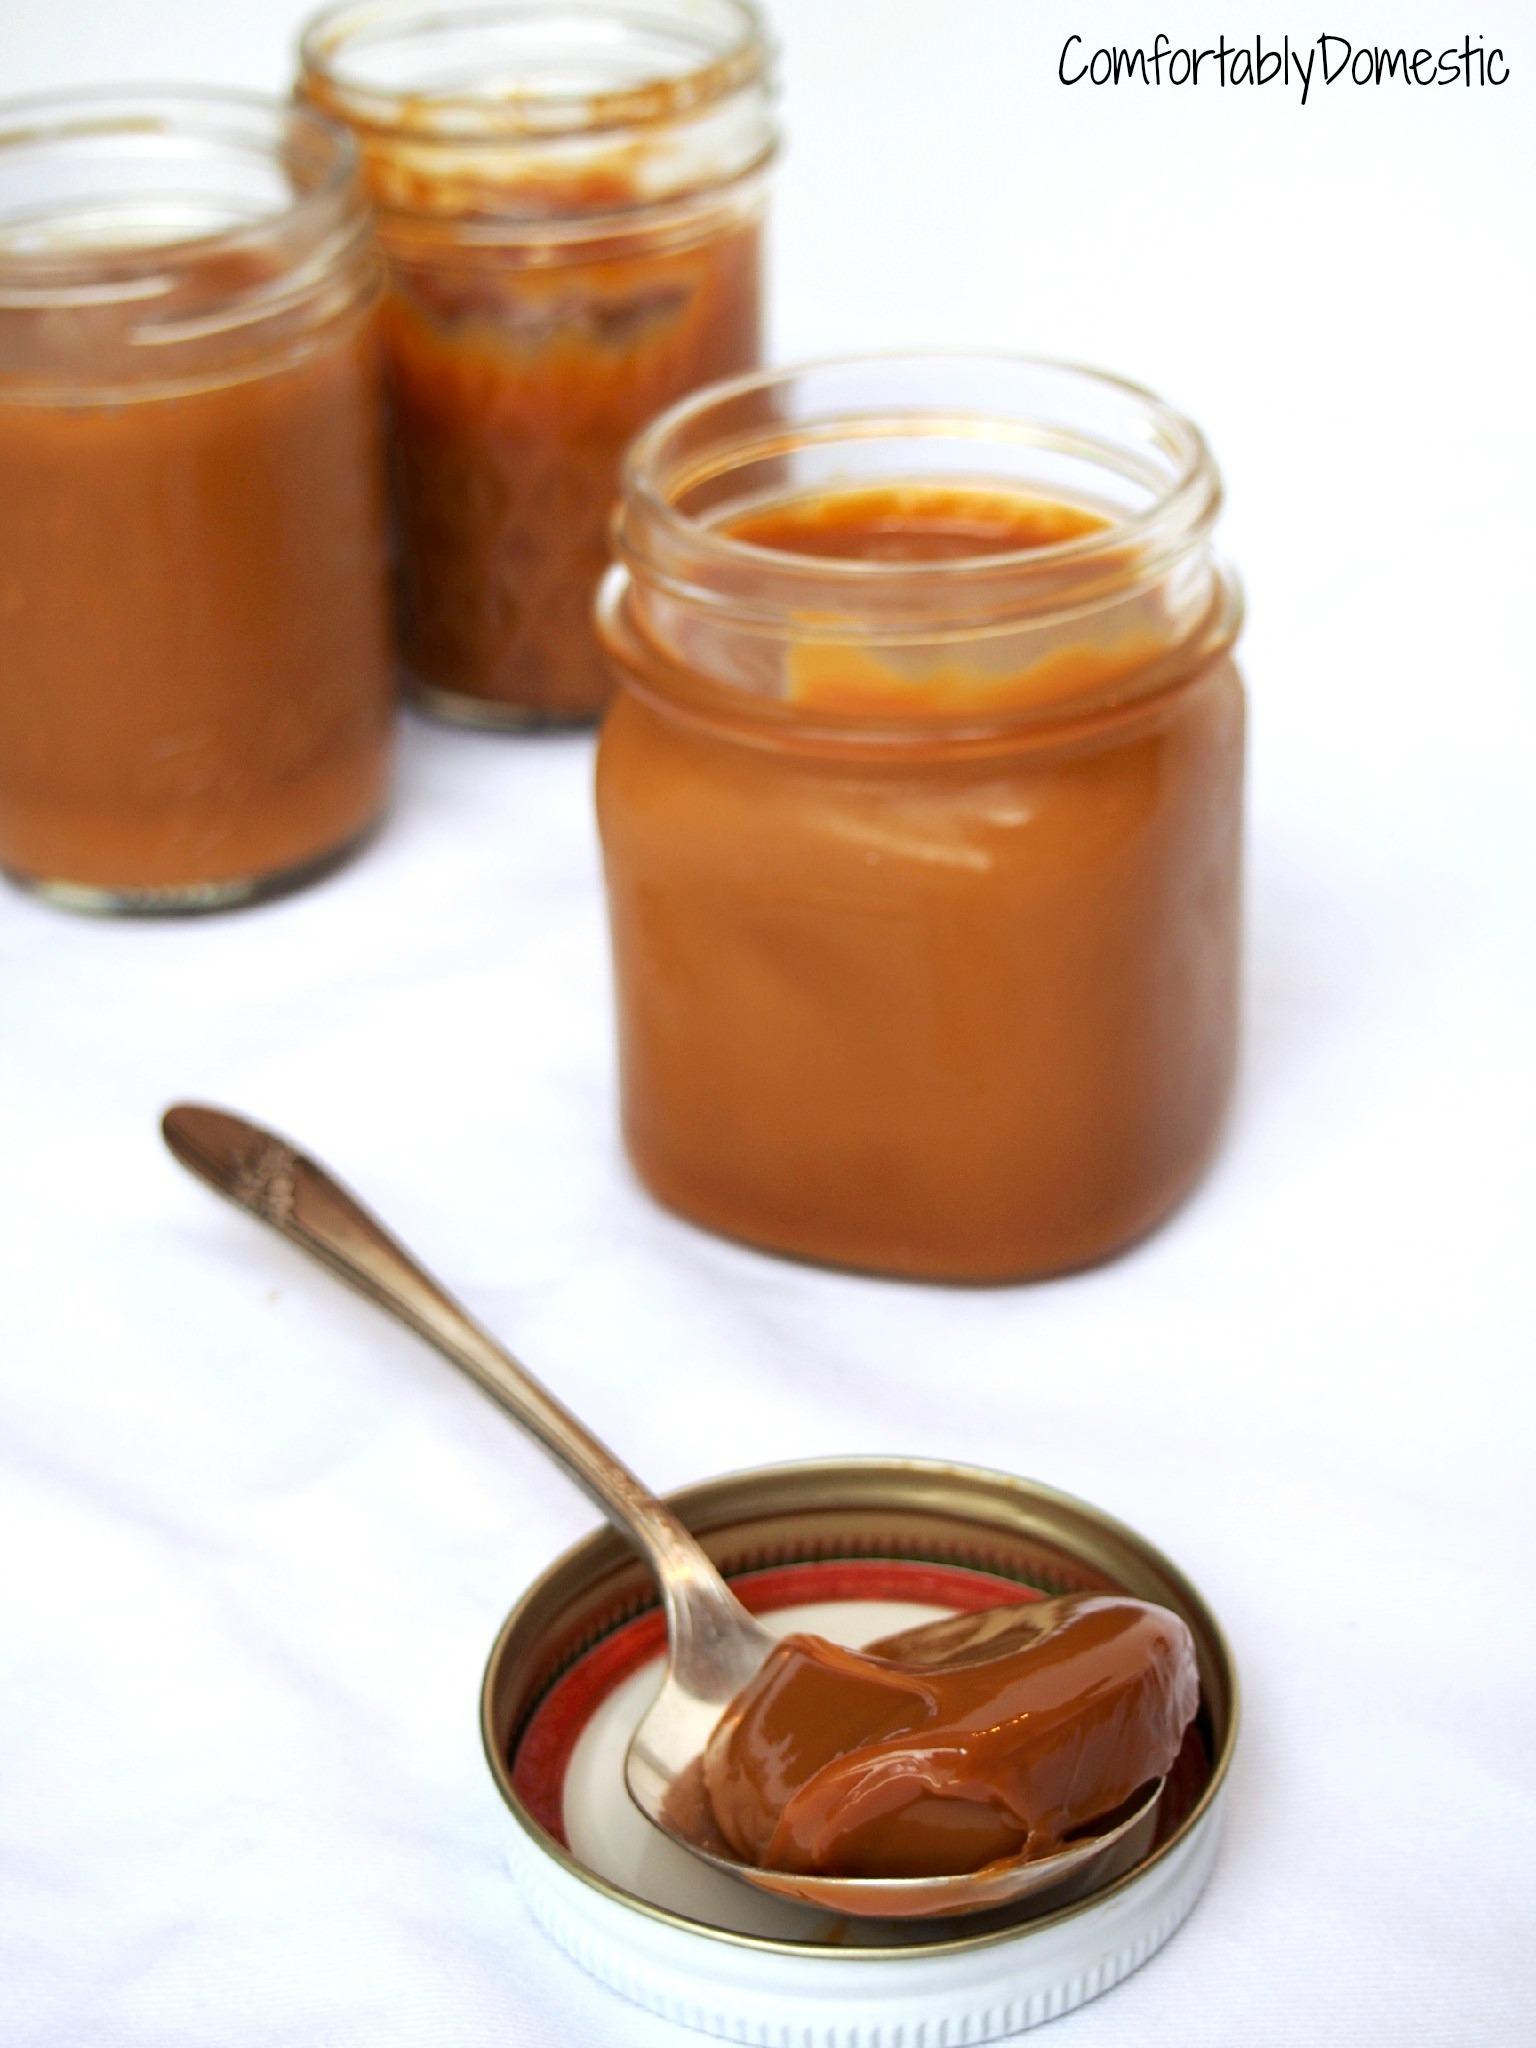 Crockpot Dulce de Leche Caramel - Comfortably Domestic